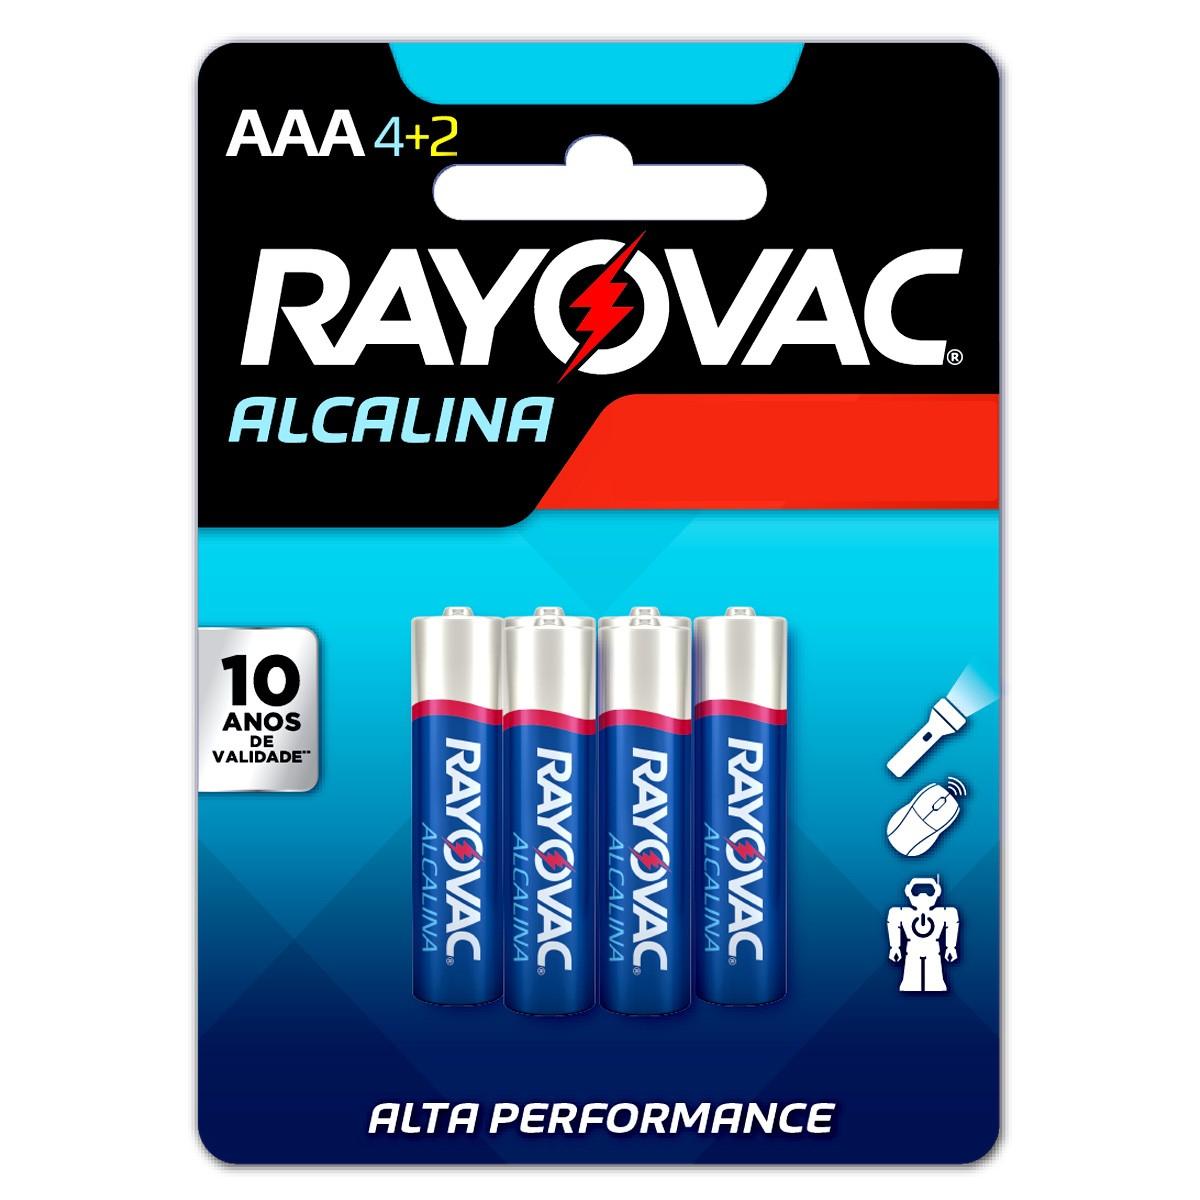 120 Pilhas AAA Alcalina RAYOVAC 20 cartelas